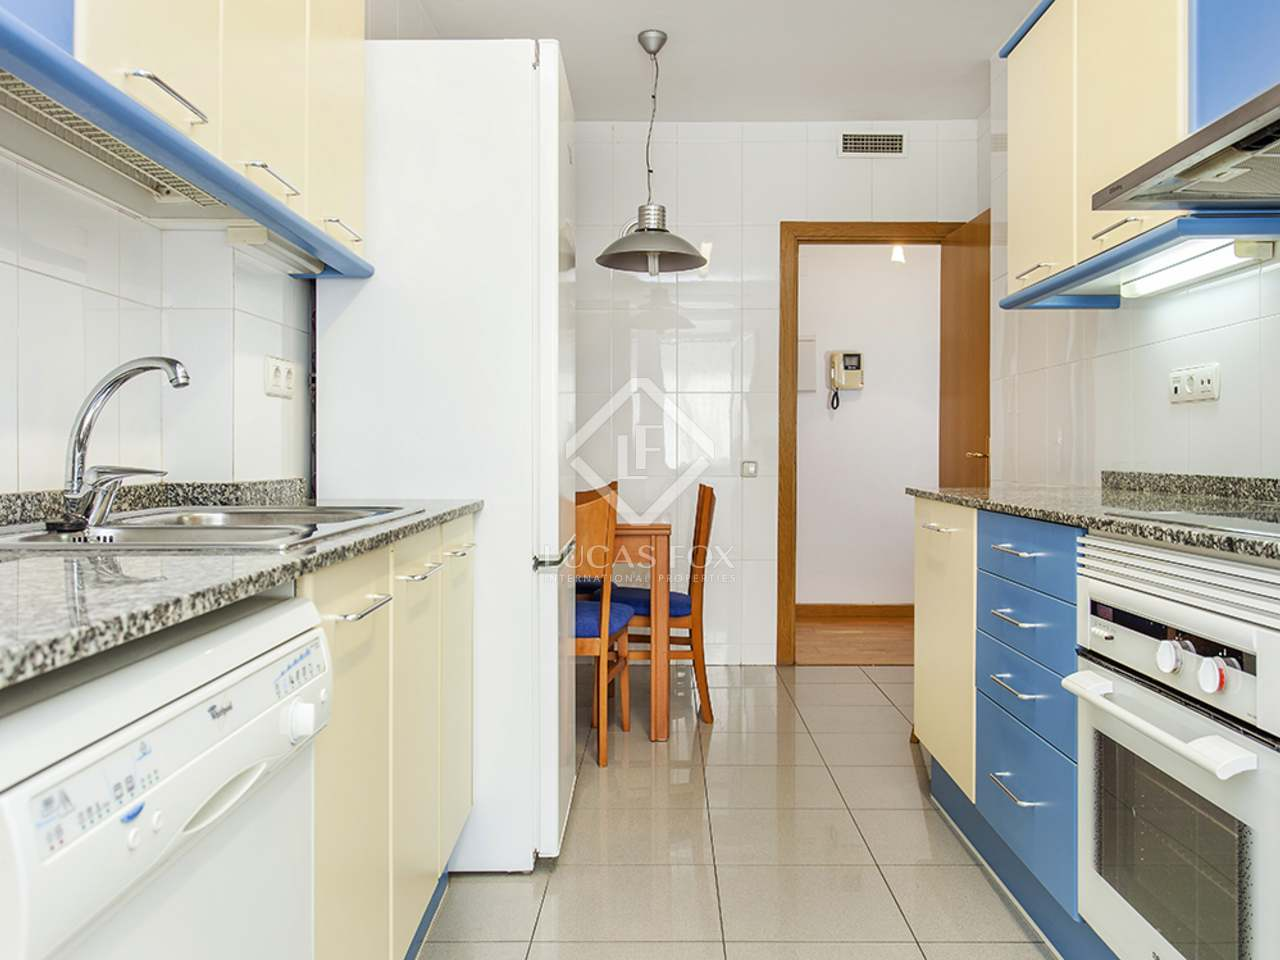 Functional apartment for rent in barcelona 39 s zona alta - Zona alta barcelona ...